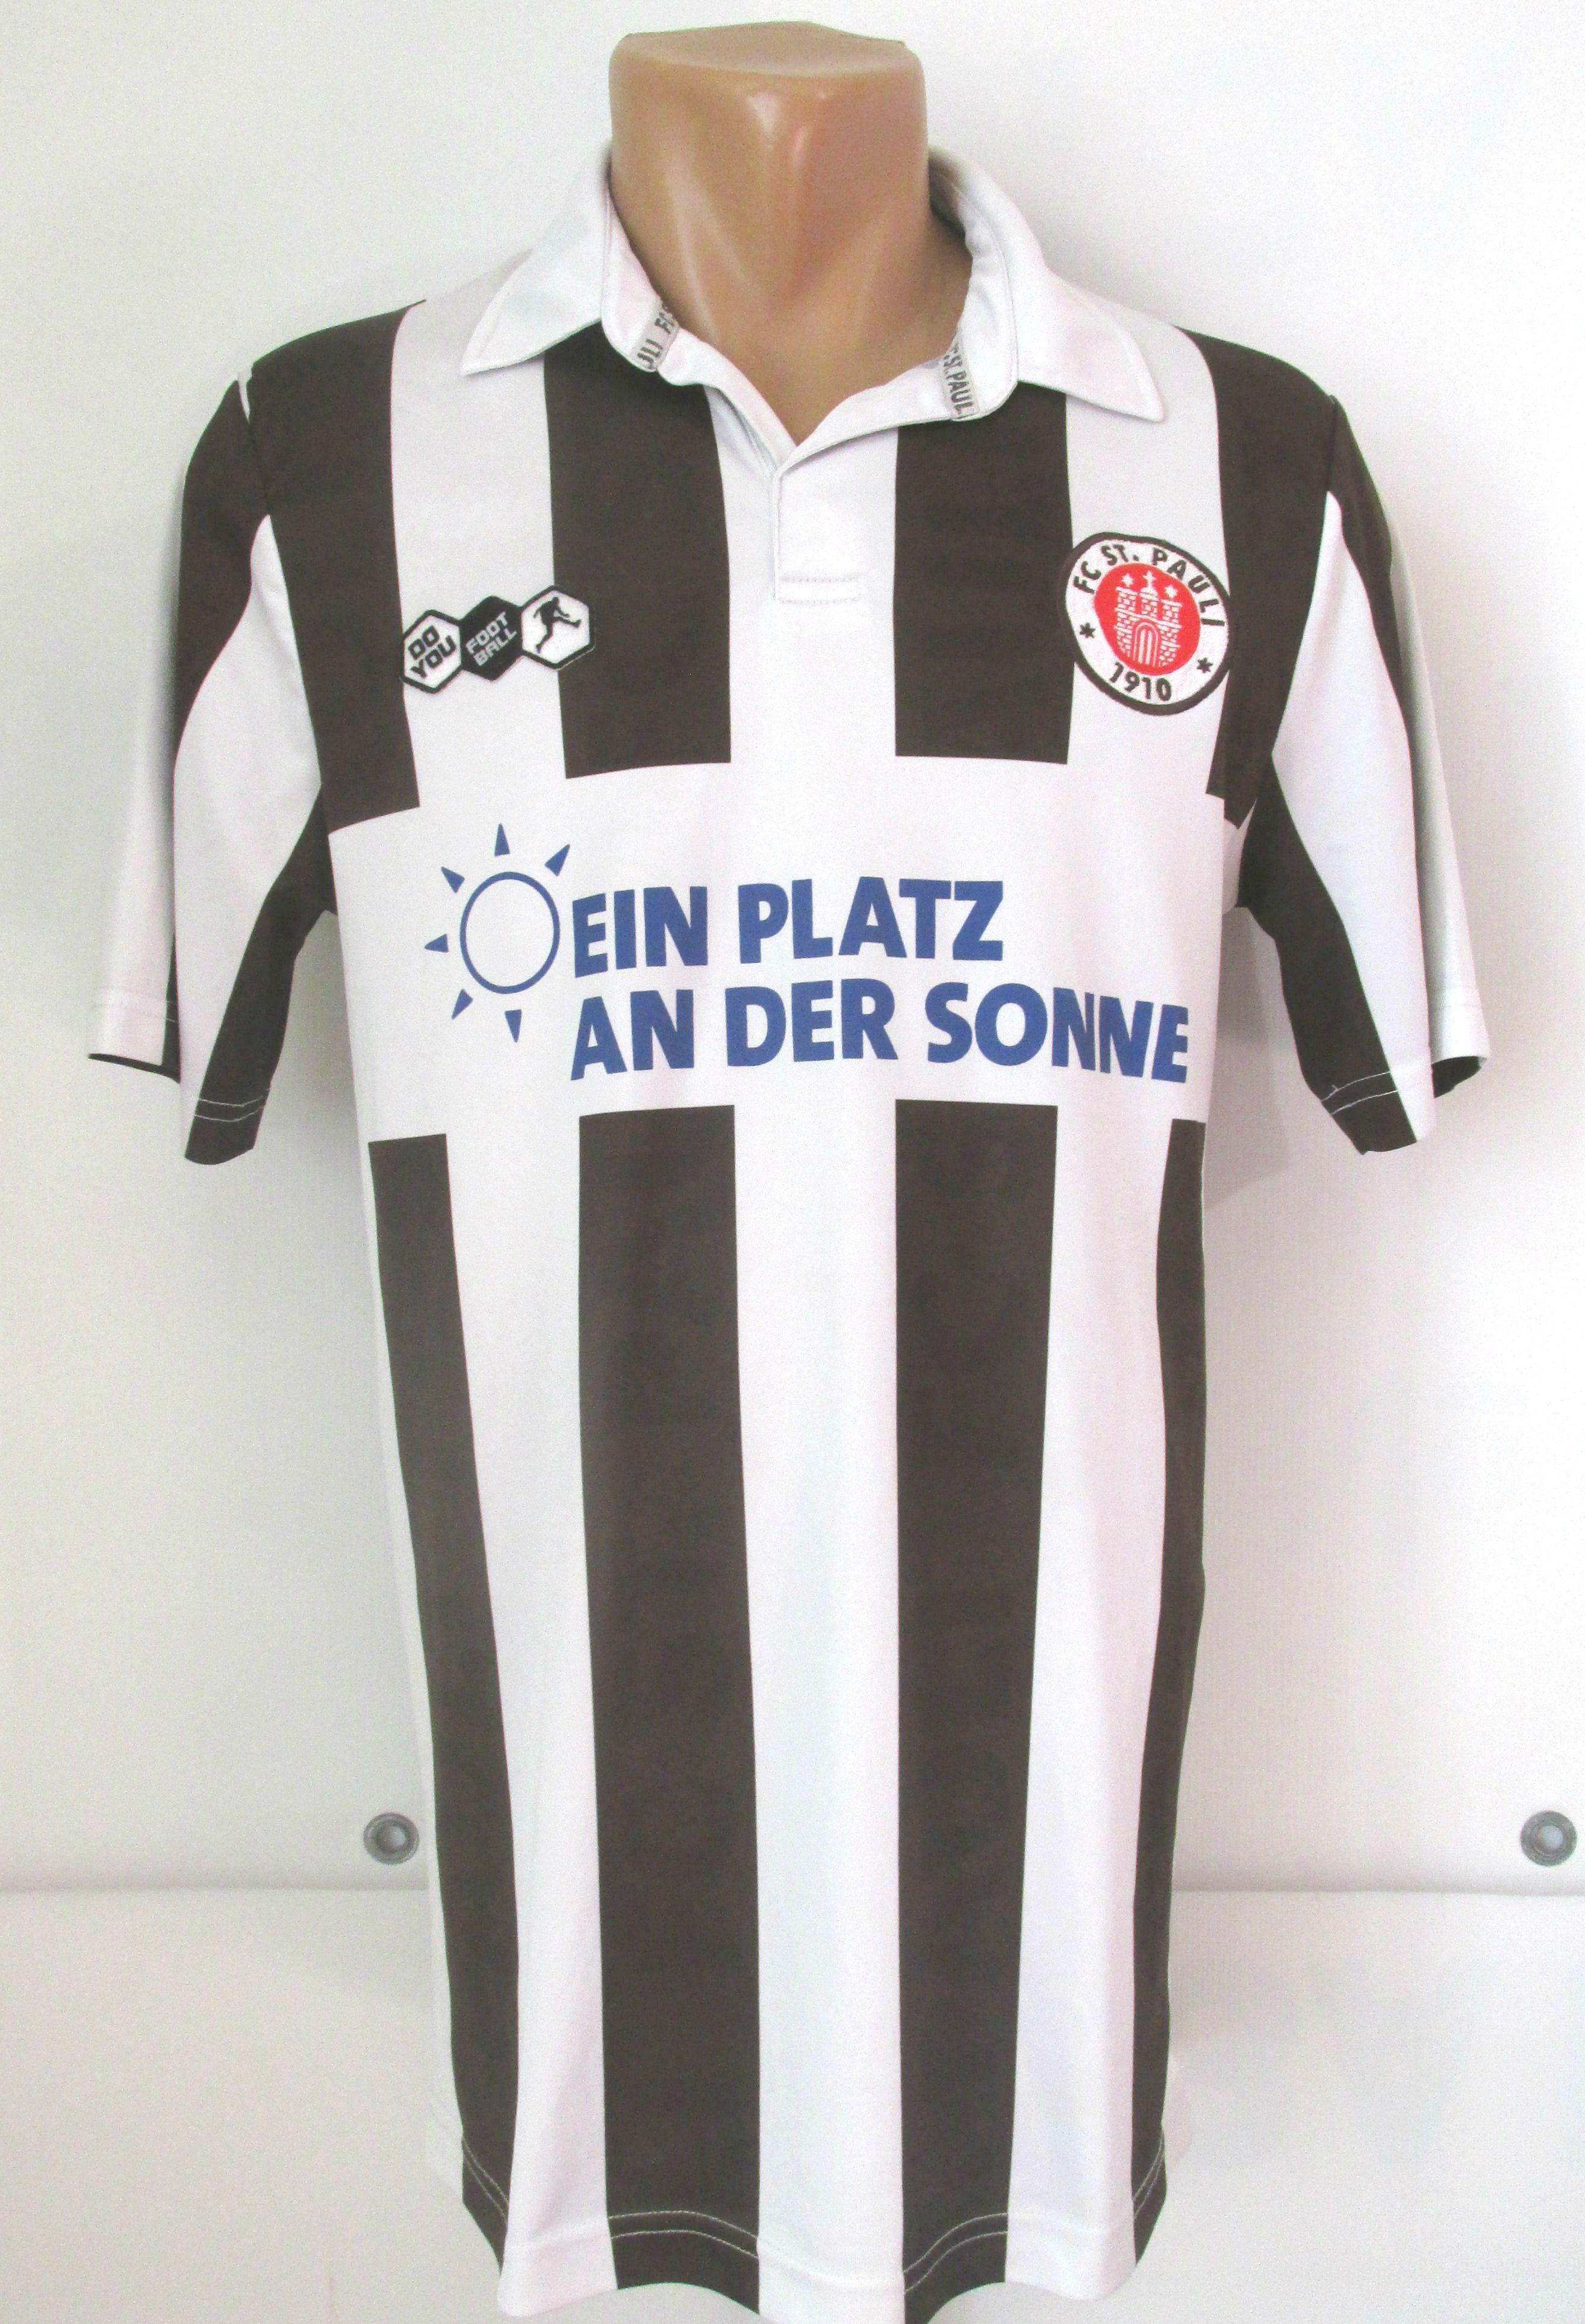 Pin on European & World soccer clubs jerseys